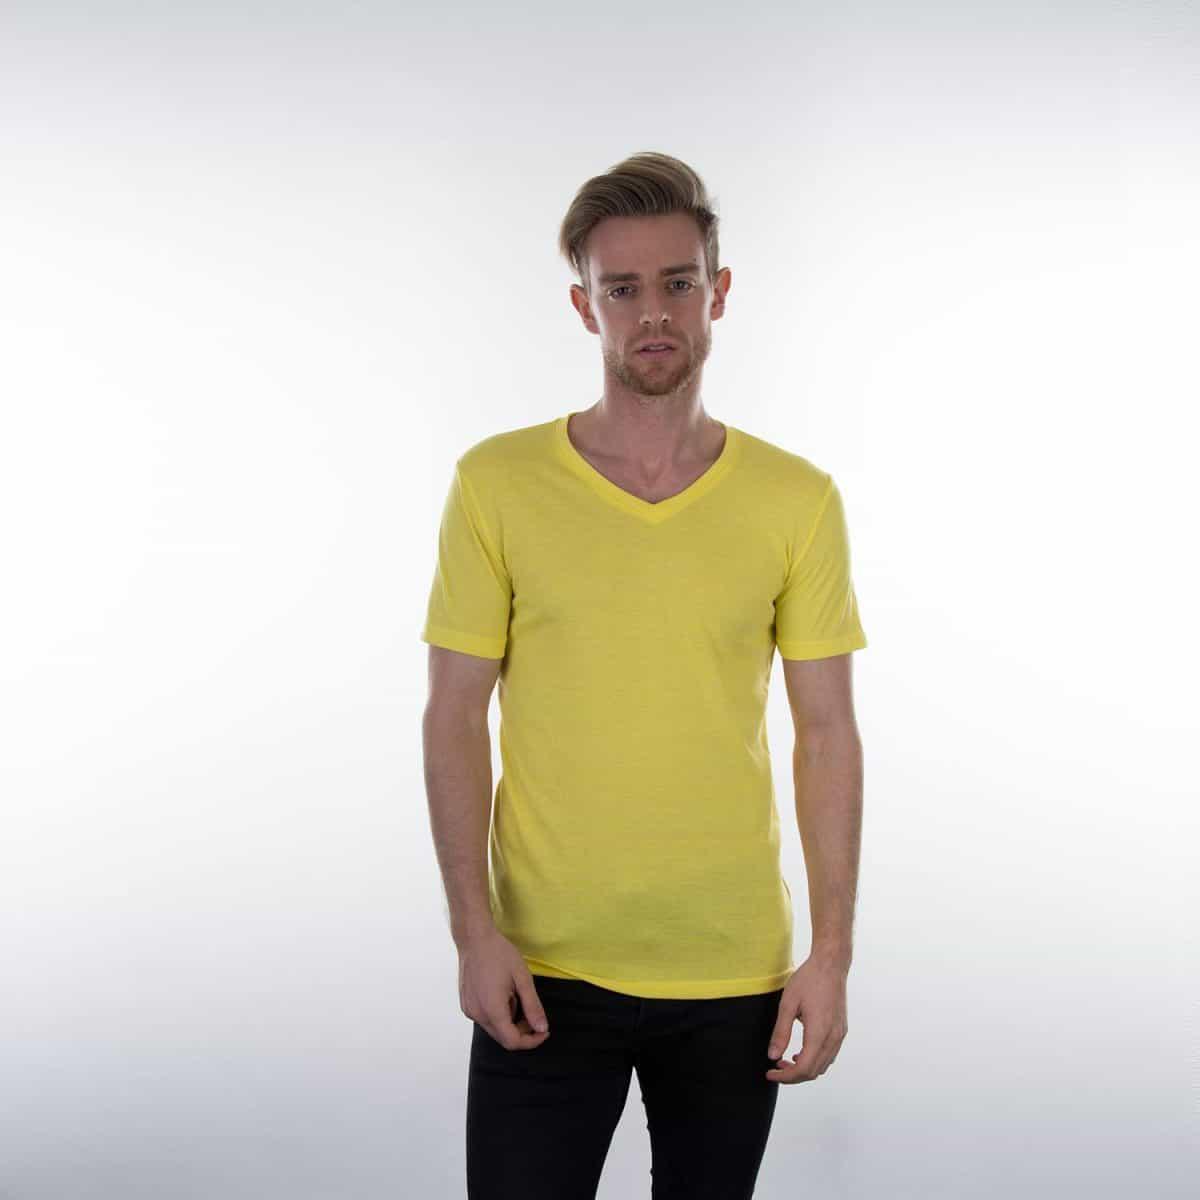 Daiber T Shirts JN974 Yellowmelange Model M